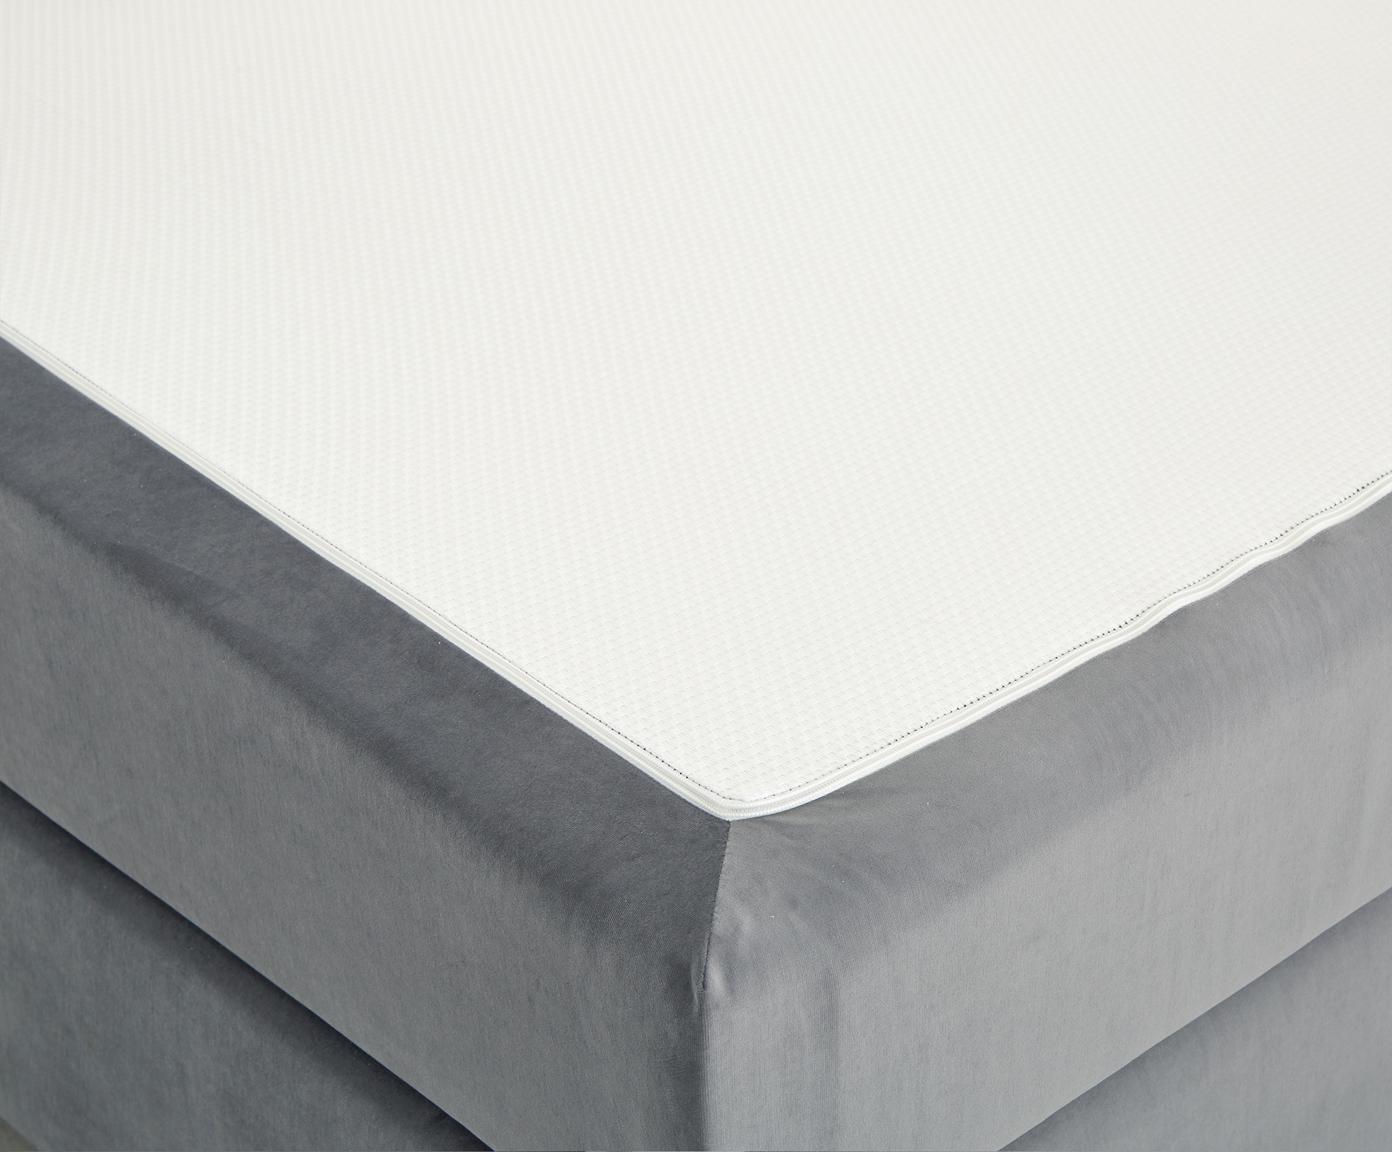 Premium Samt-Boxspringbett Lacey, Matratze: 7-Zonen-Taschenfederkern , Füße: Massives Buchenholz, lack, Dunkelgrau, 140 x 200 cm